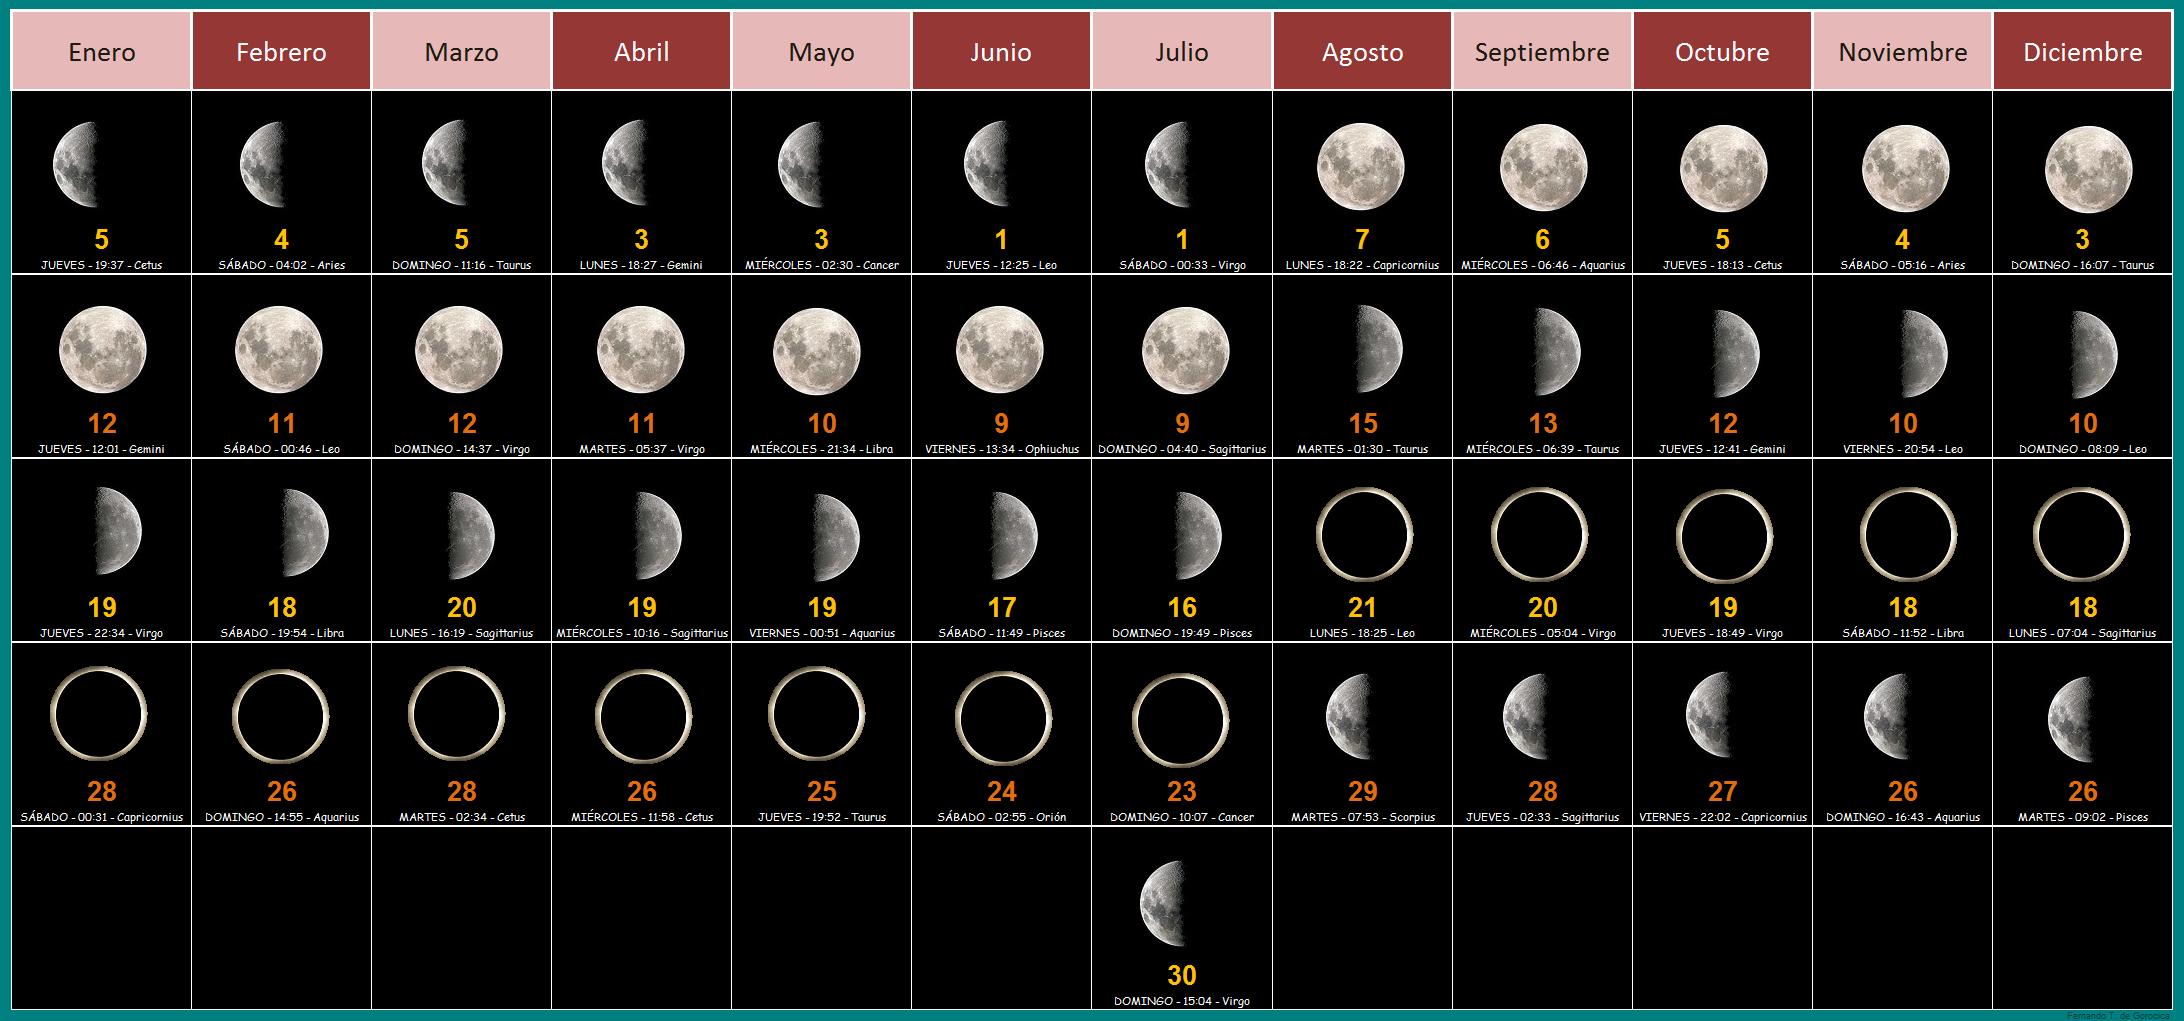 Lunar Calendar  Wikipedia inside What Is The Lunar Calendar Date Today